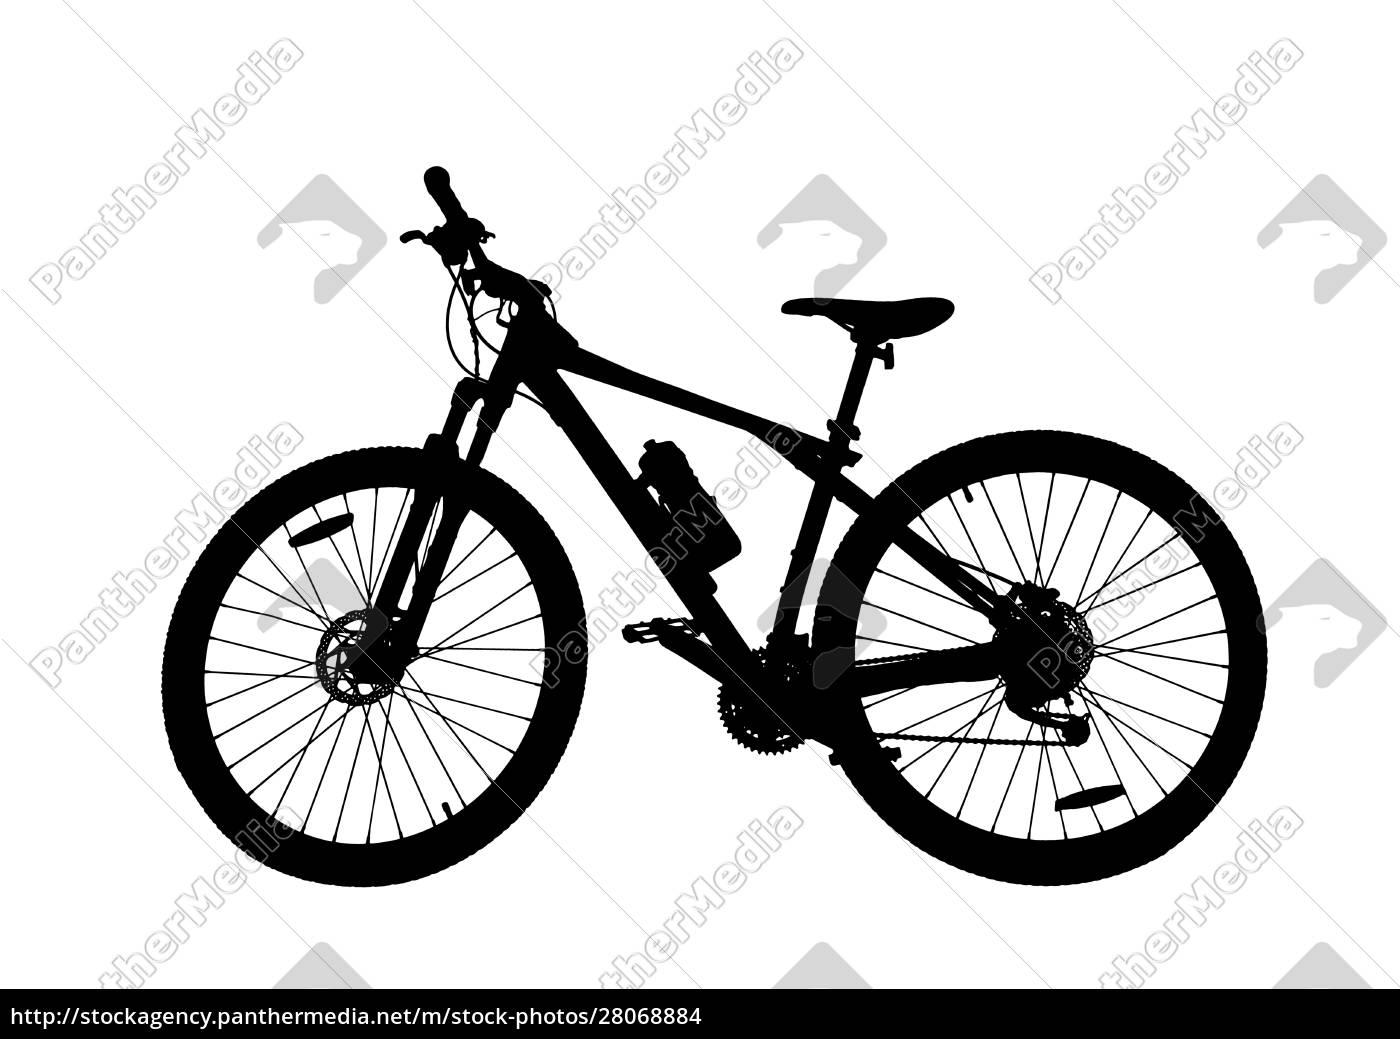 mountain, bike - 28068884